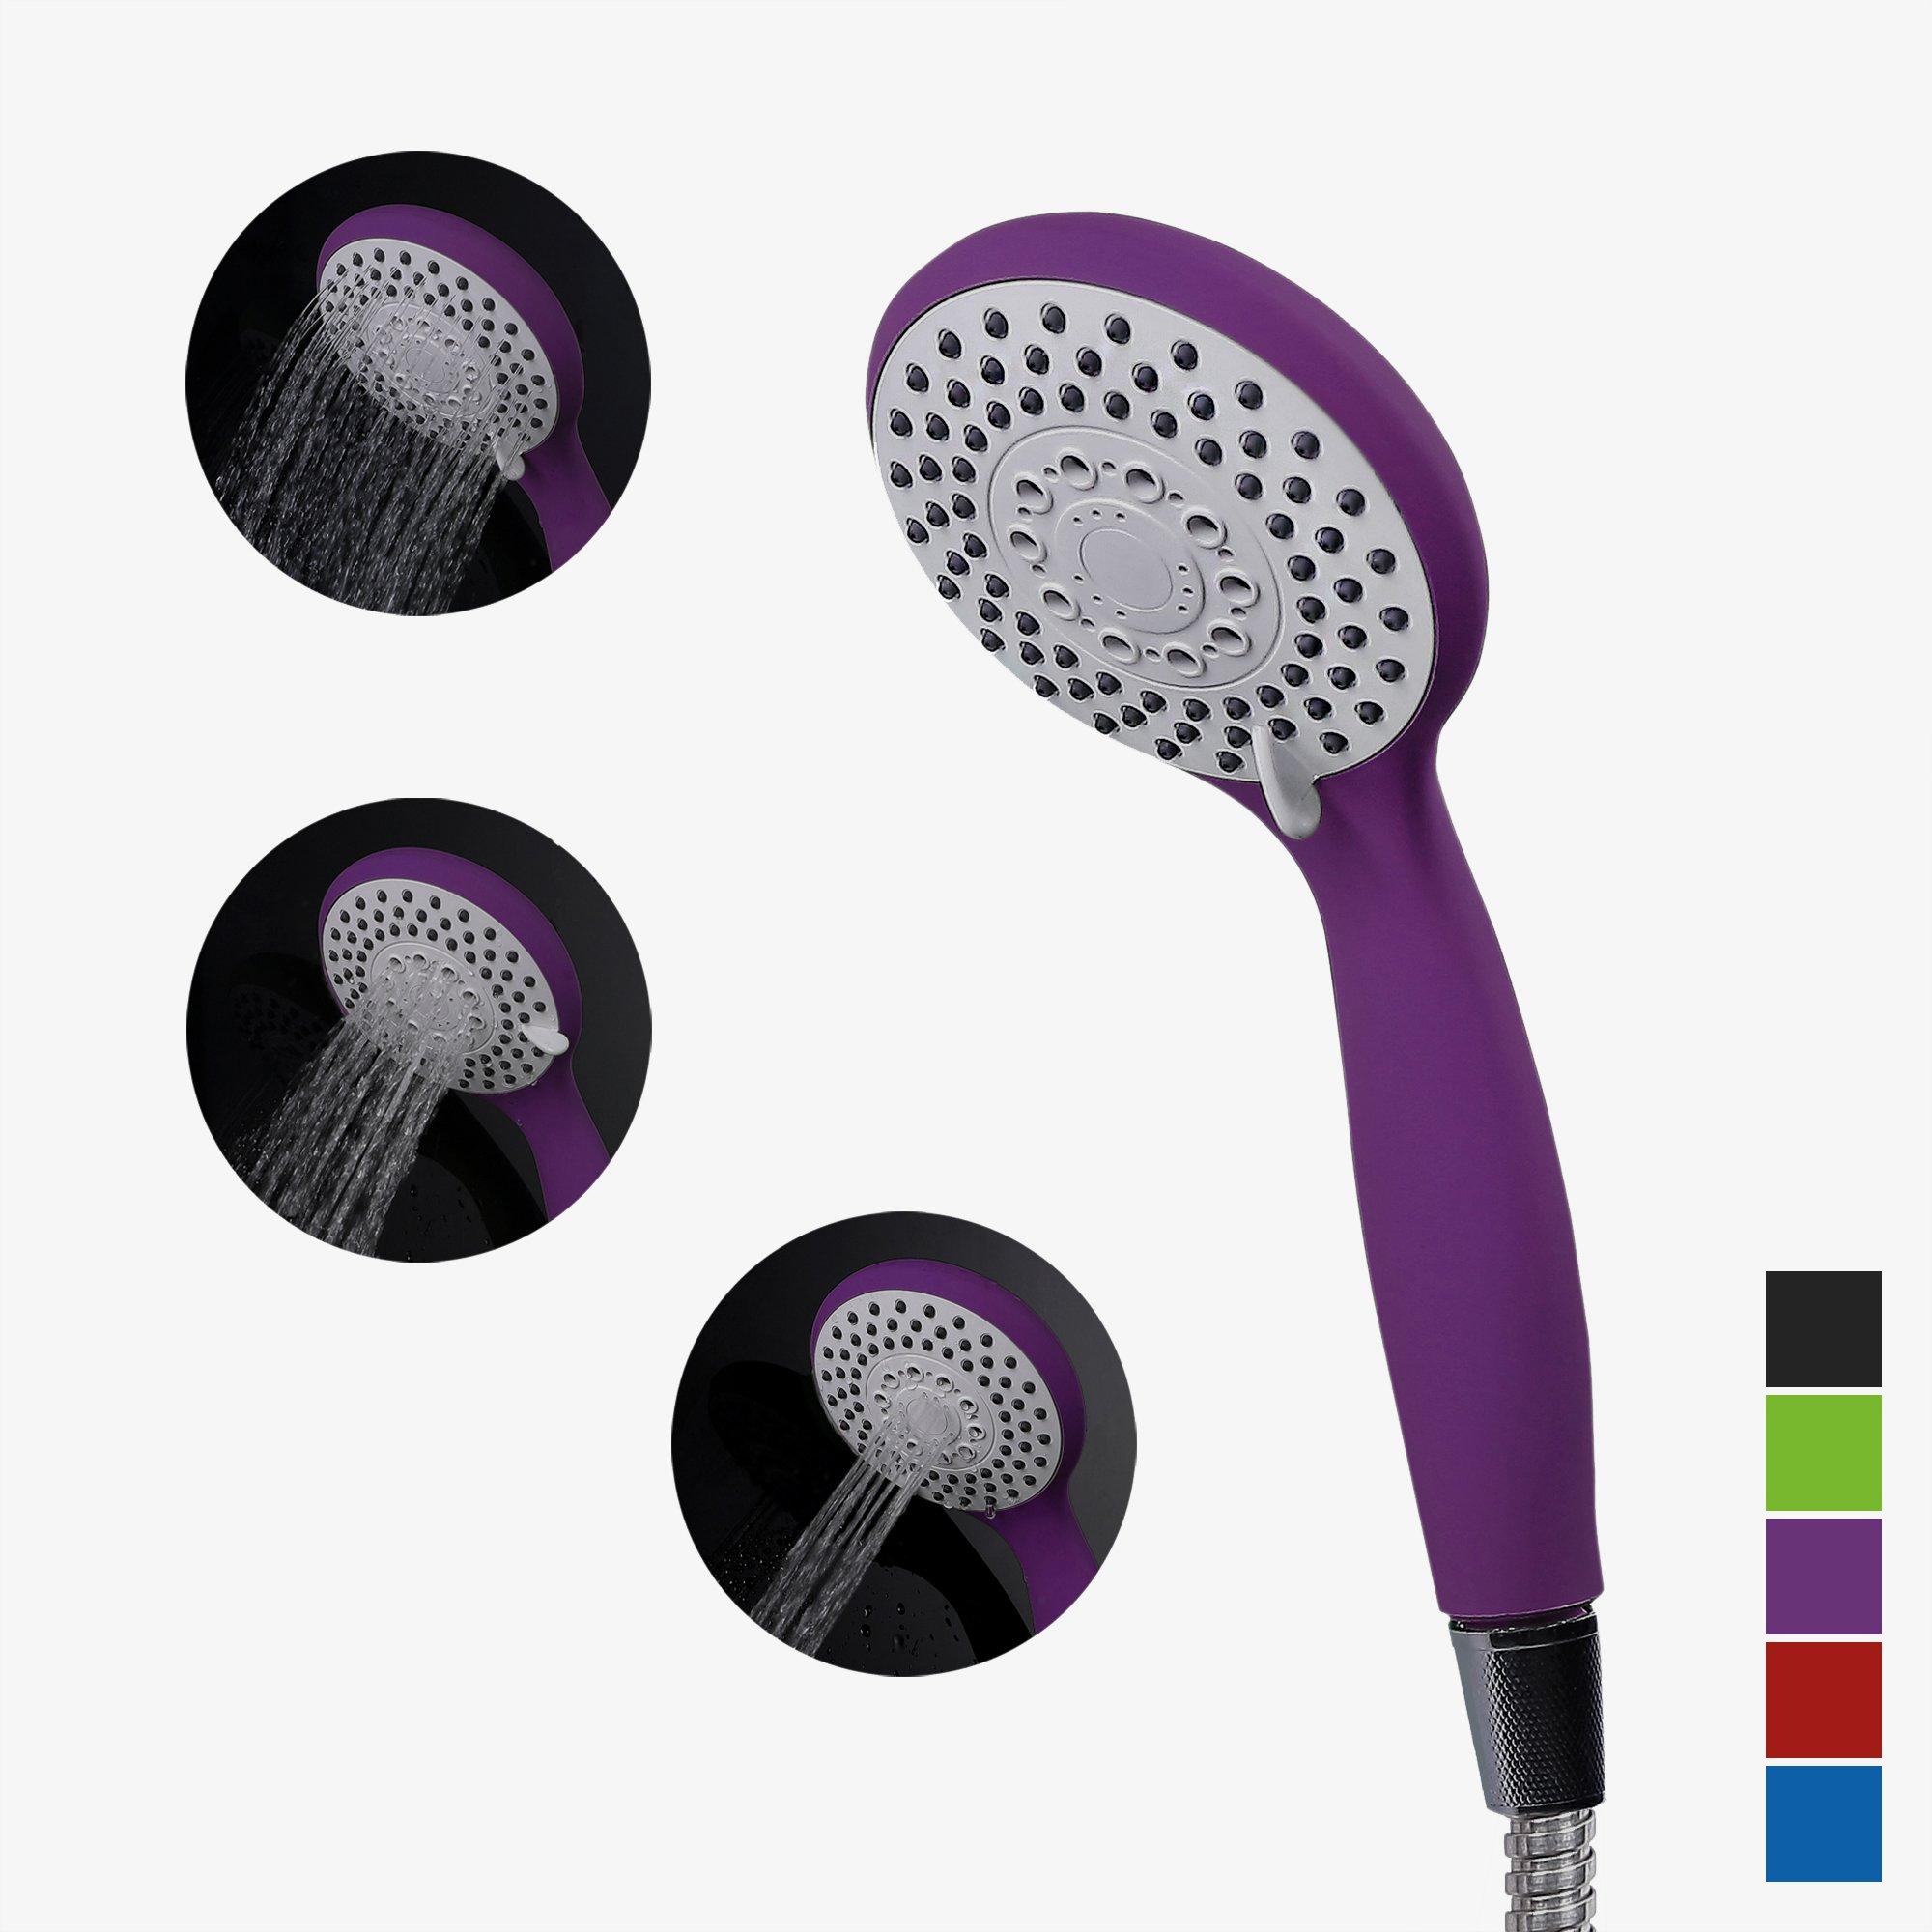 Handheld Shower Head,Hand shower head Matte Purple Sprayer bath SPA Massagehead Silicone Nozzles 4 Spray Setting Water Saving Rating 2.0GPM -Elegantly Designed Color Purple